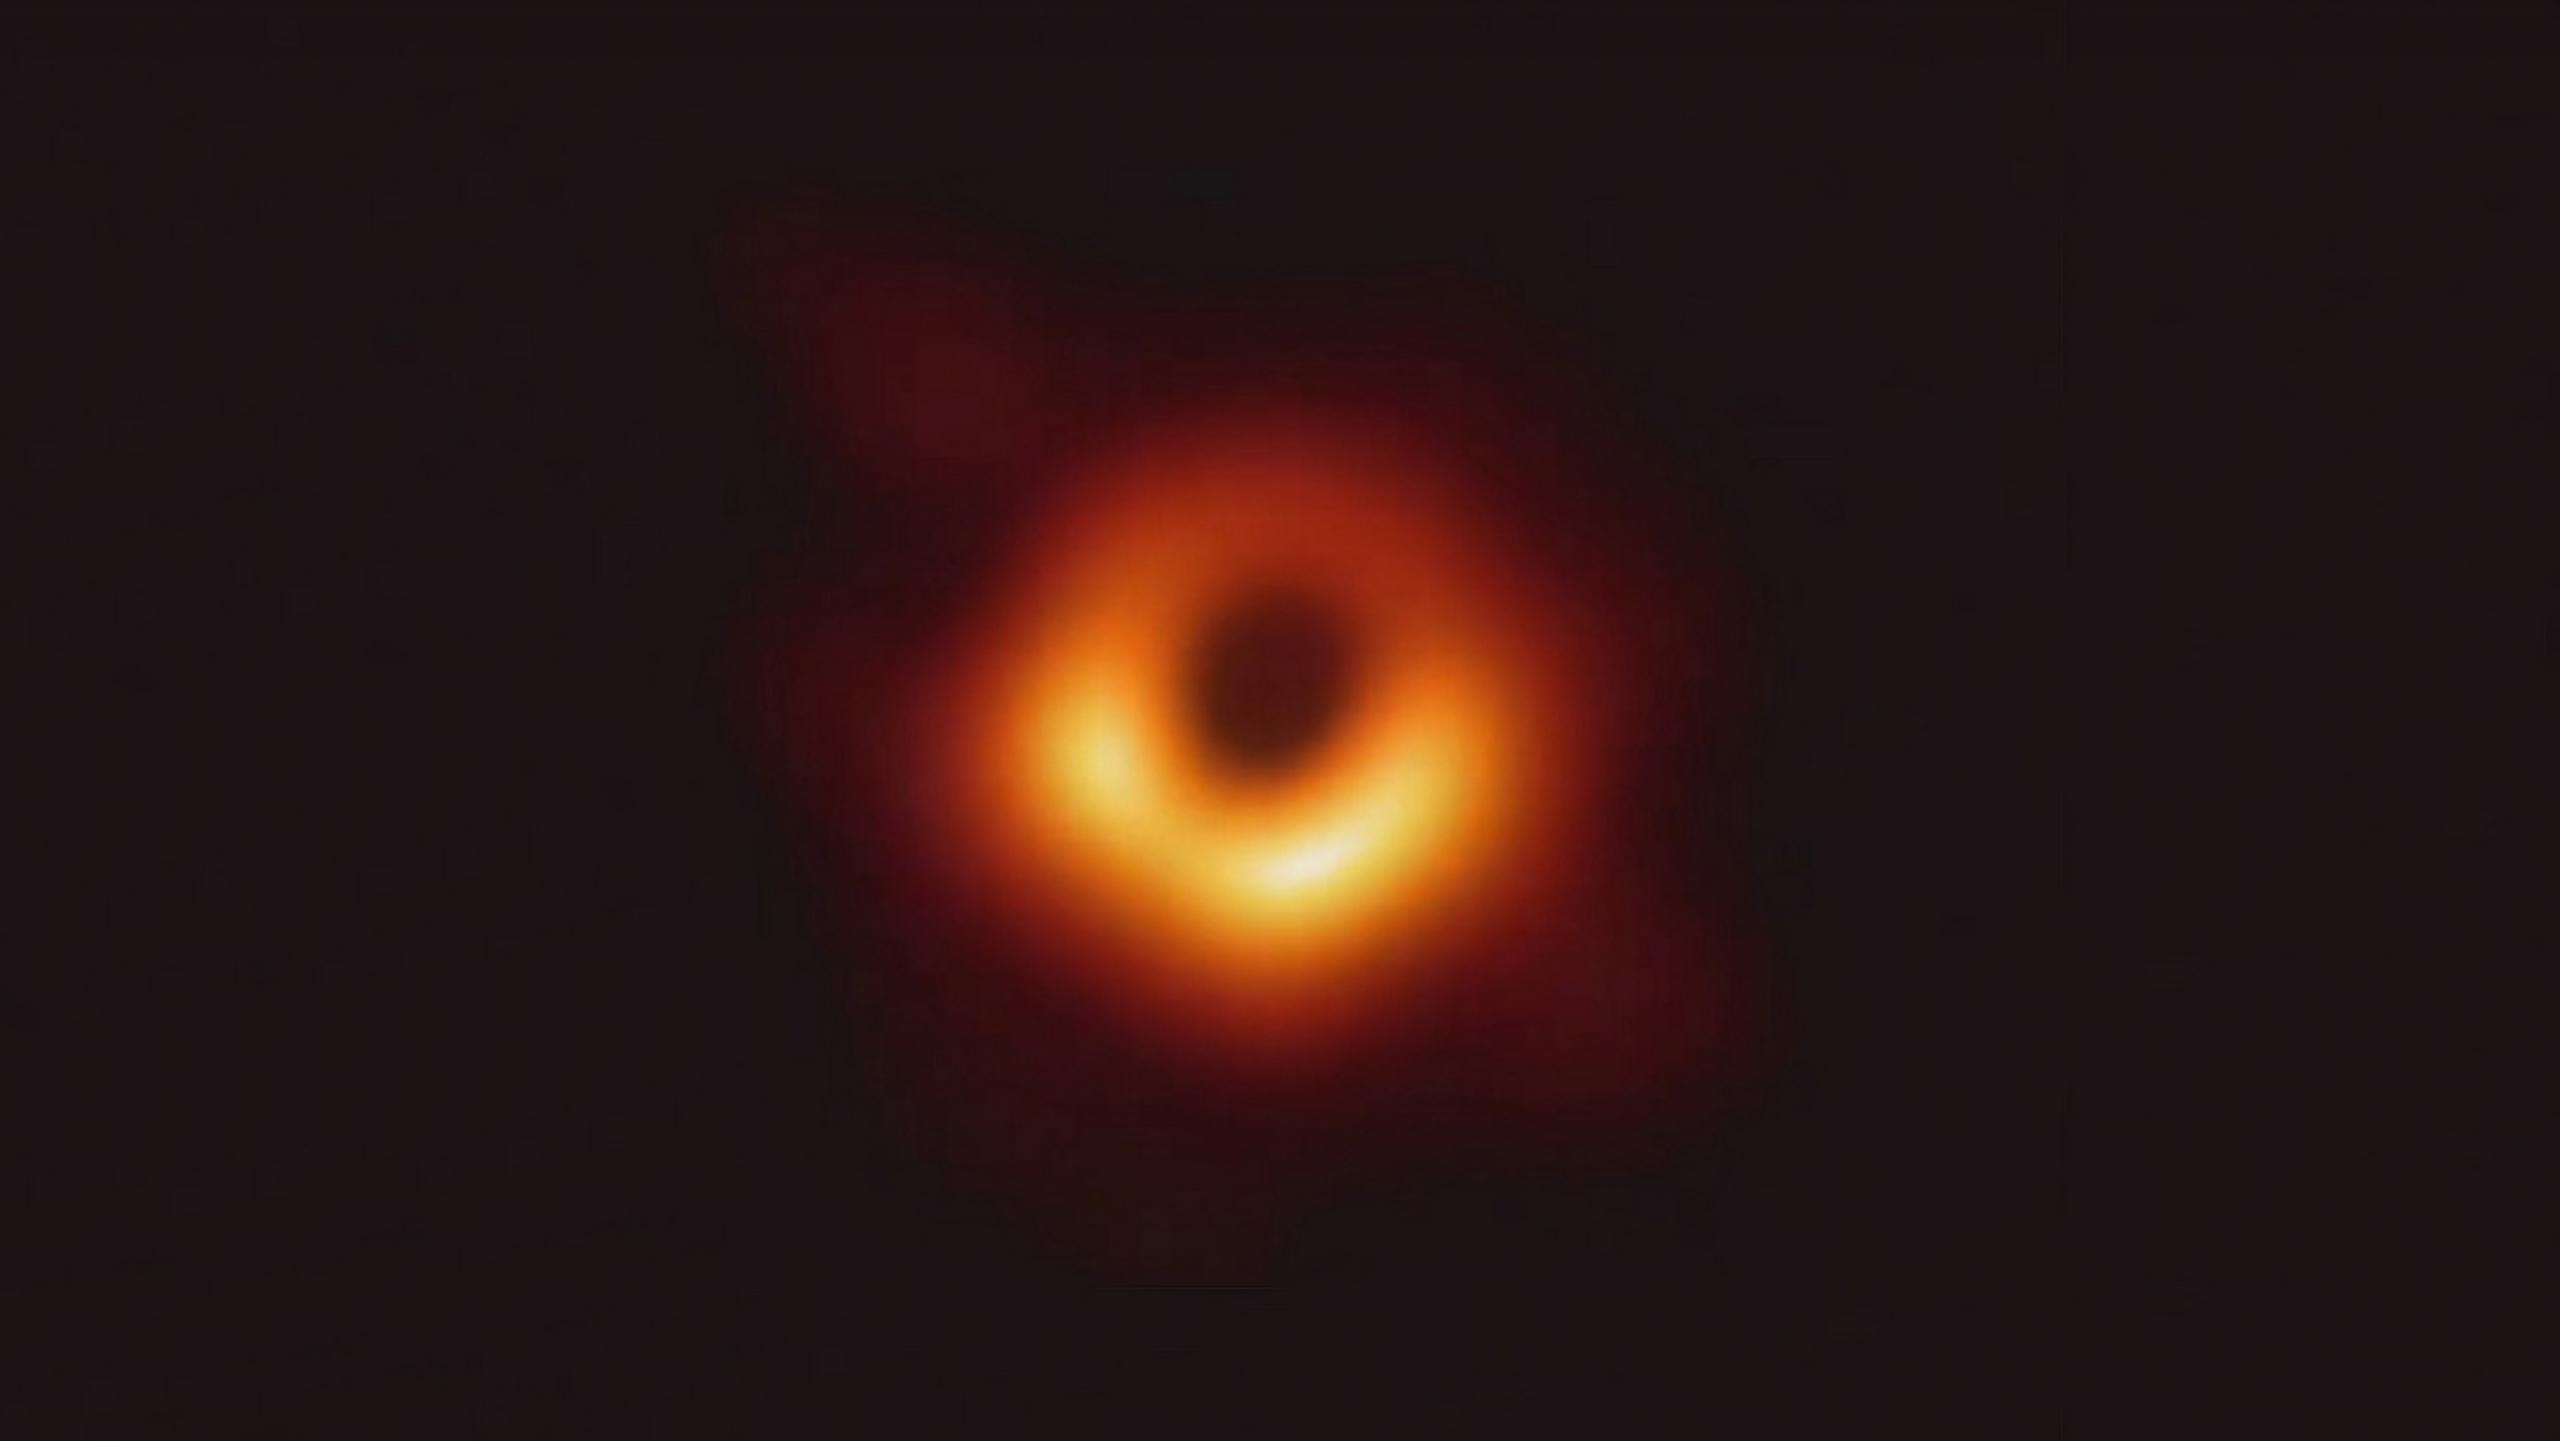 blackhole20190410-16.jpg